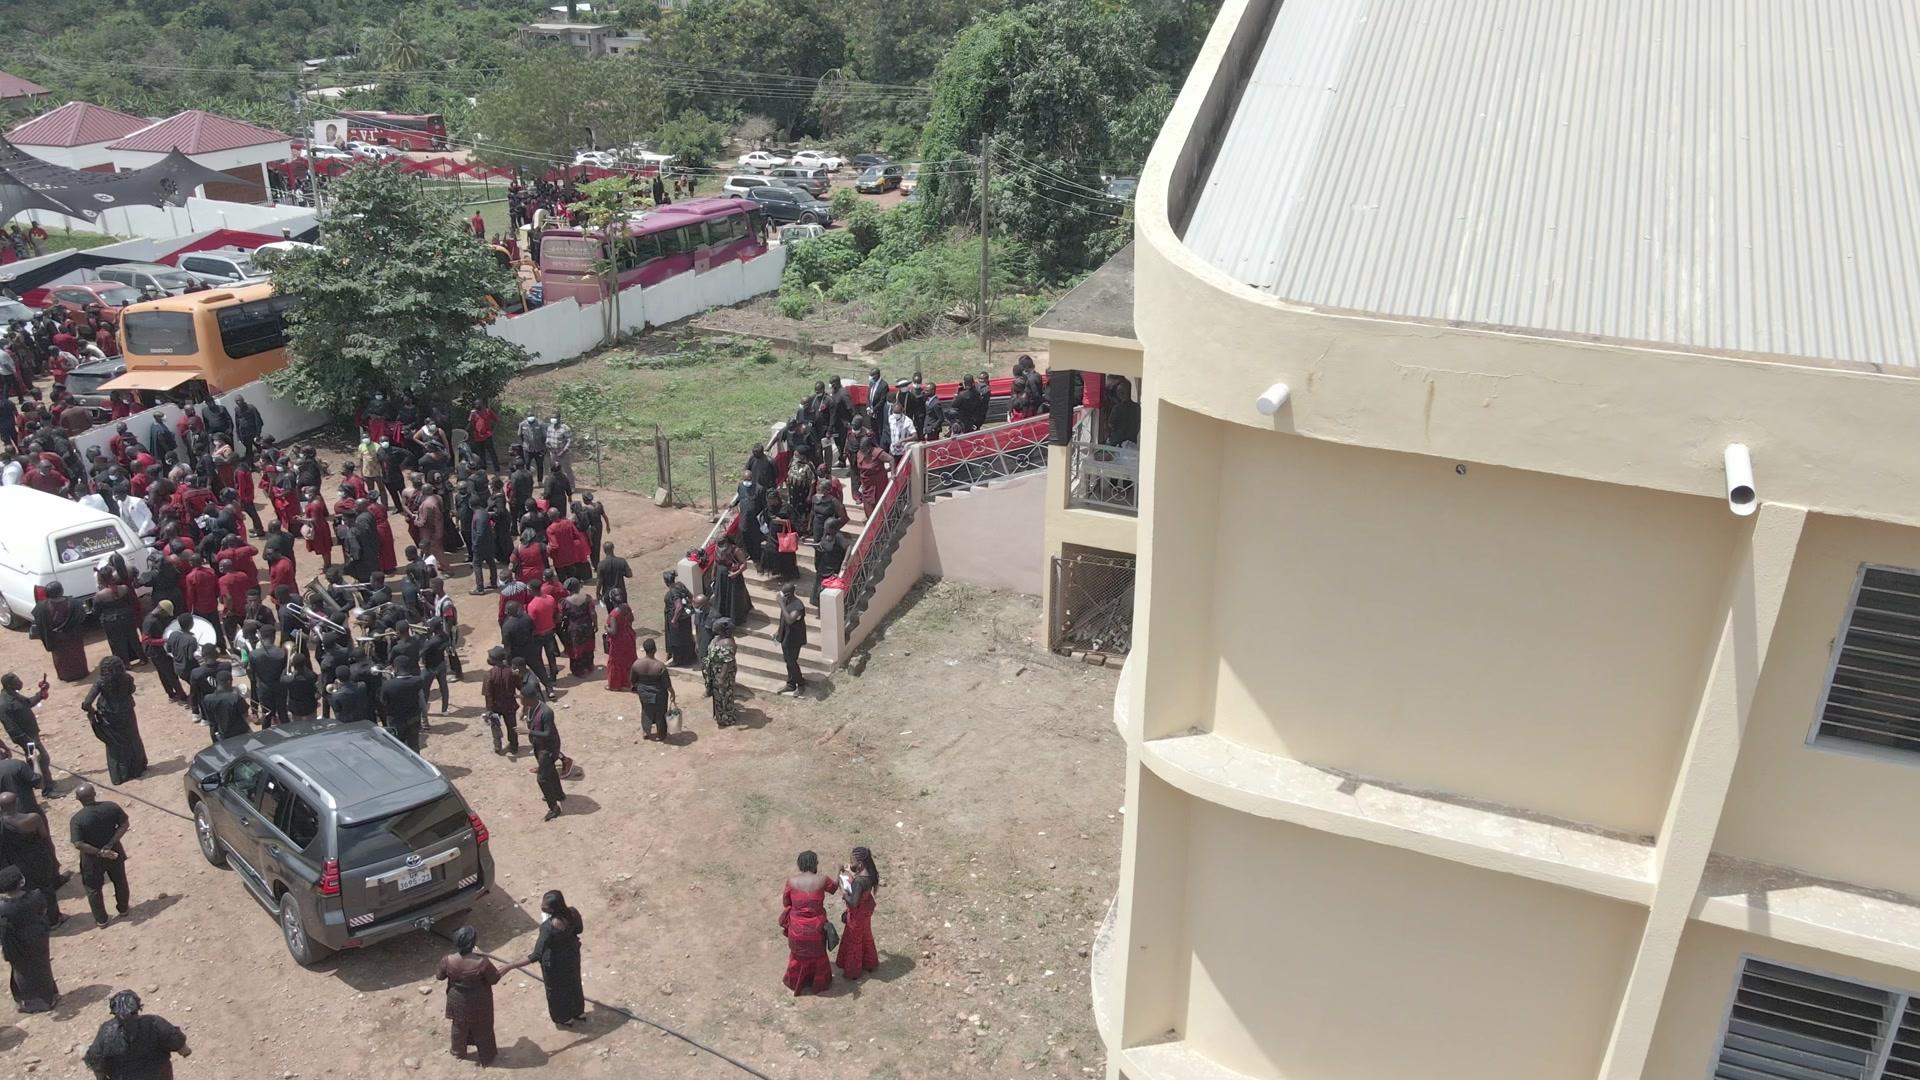 Church Funeral Procession Hearse Paulbearers